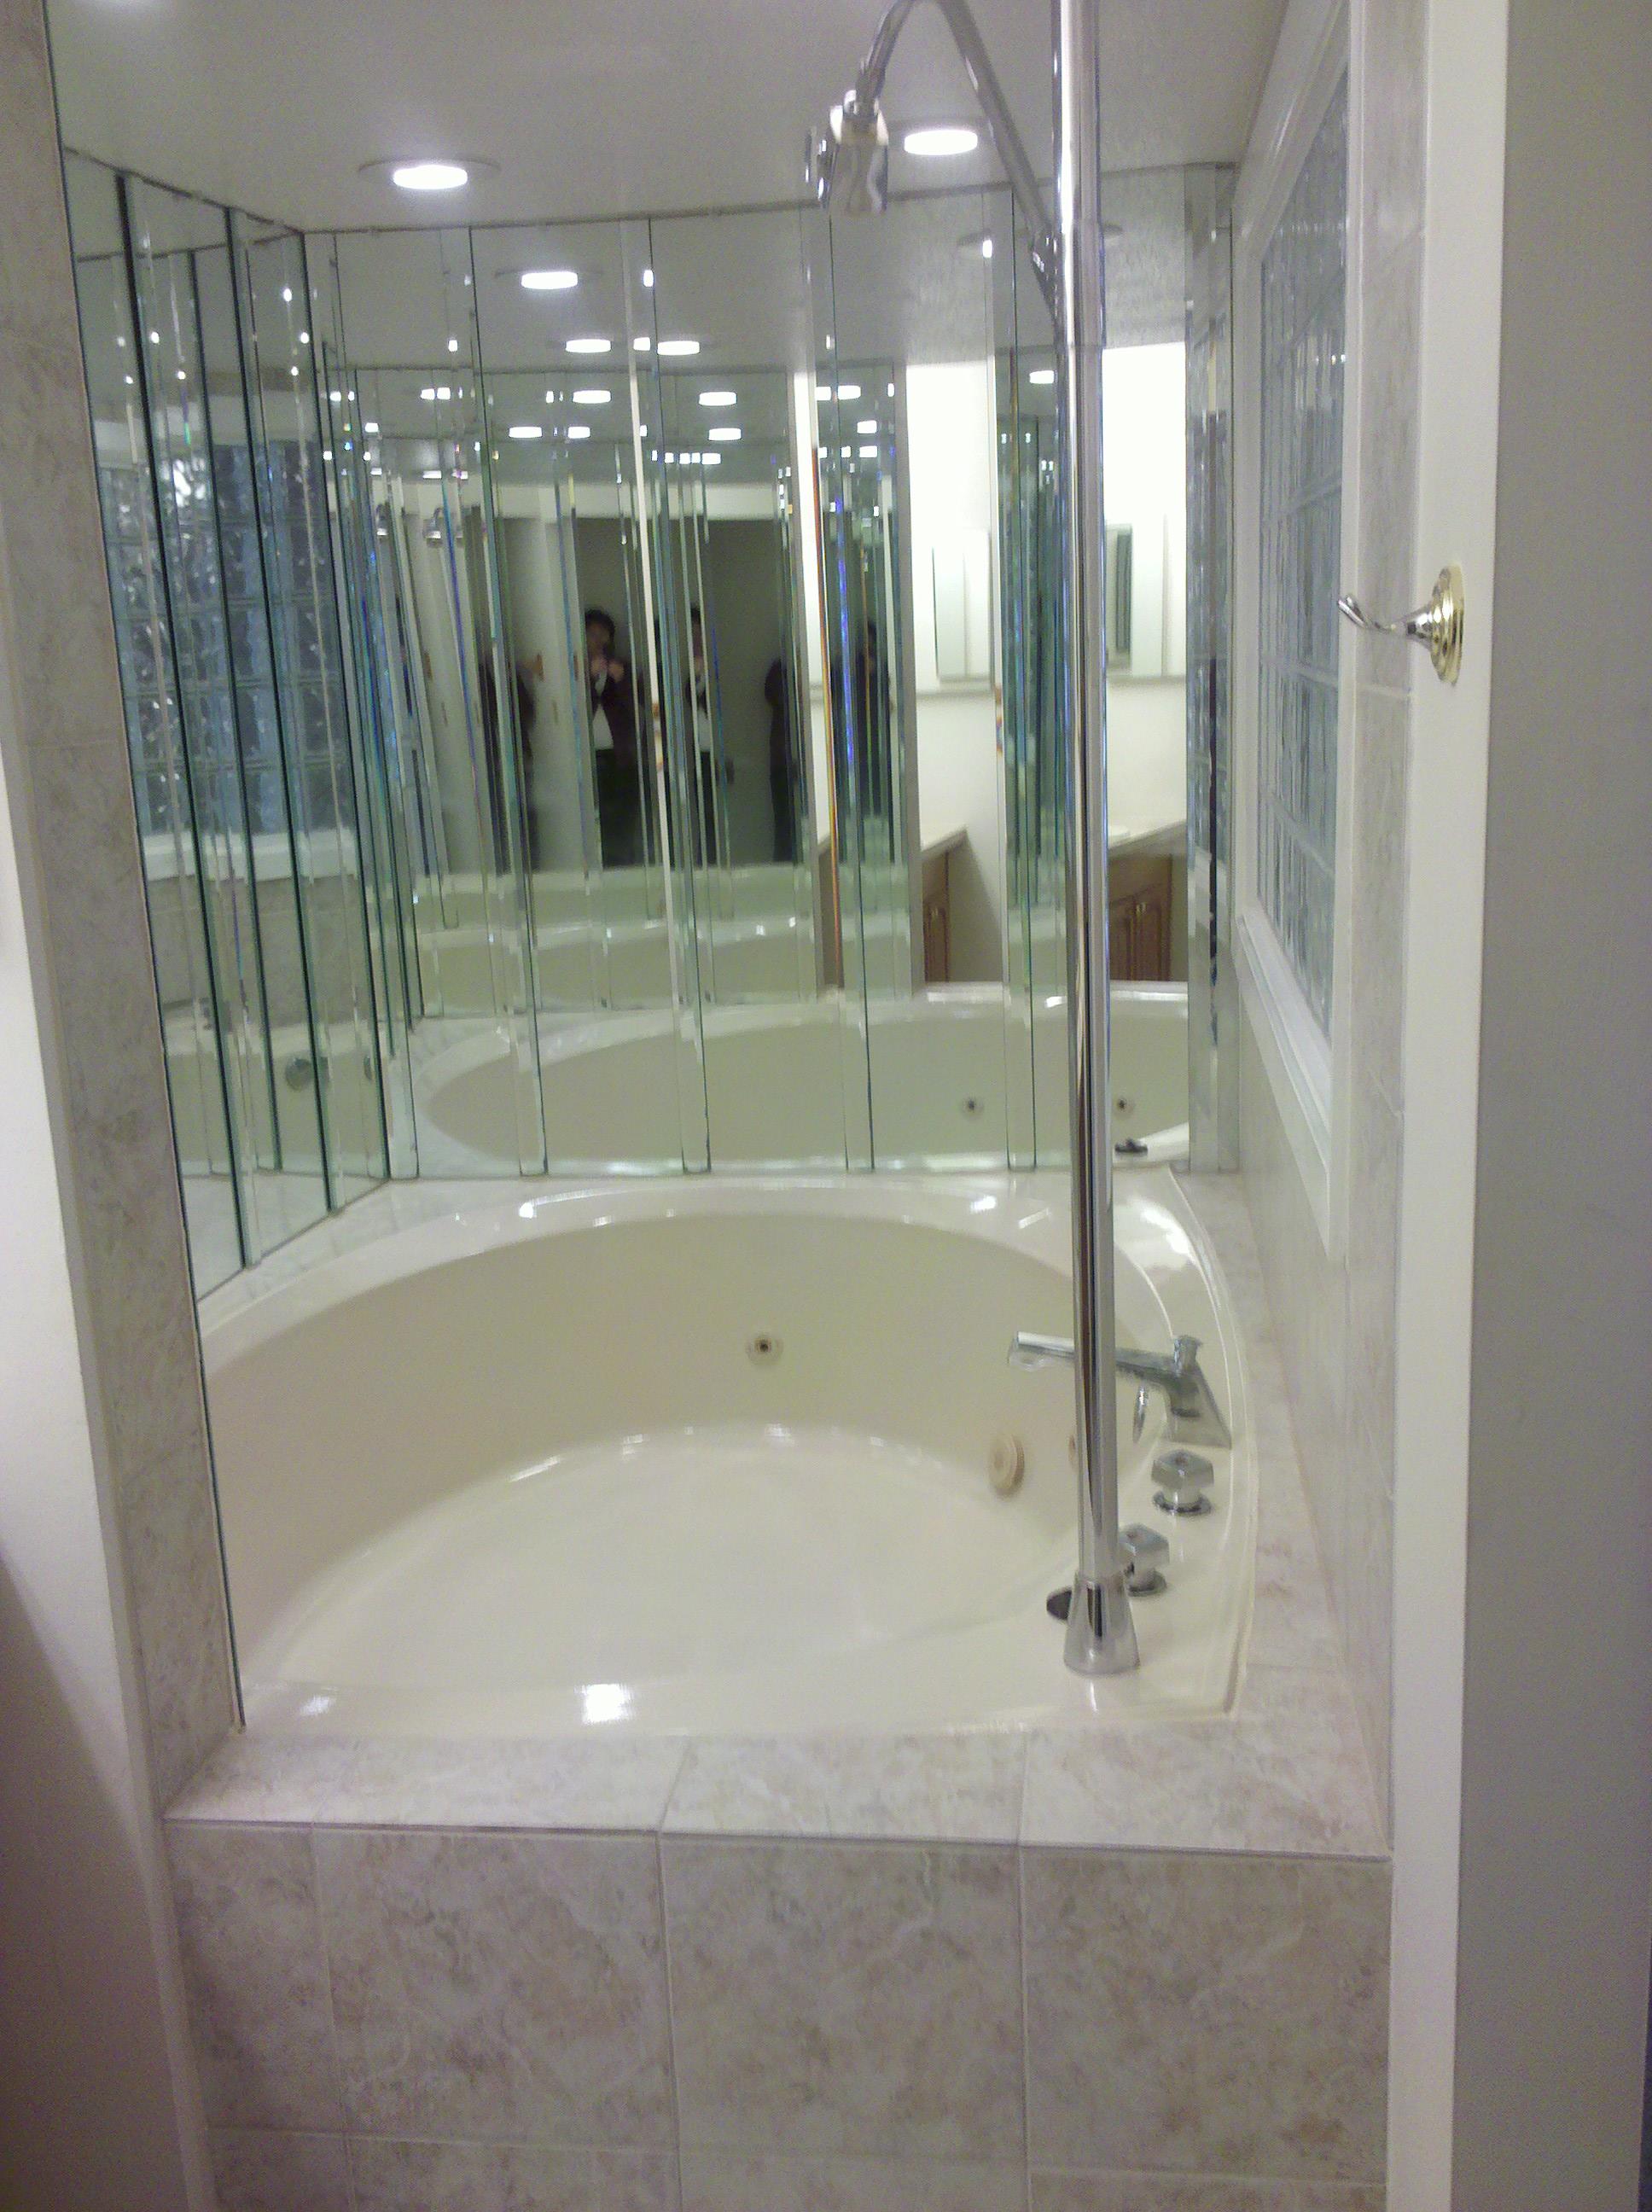 Home Remodeling Eliminate Ugly Tubs Amp Tile Future Expat